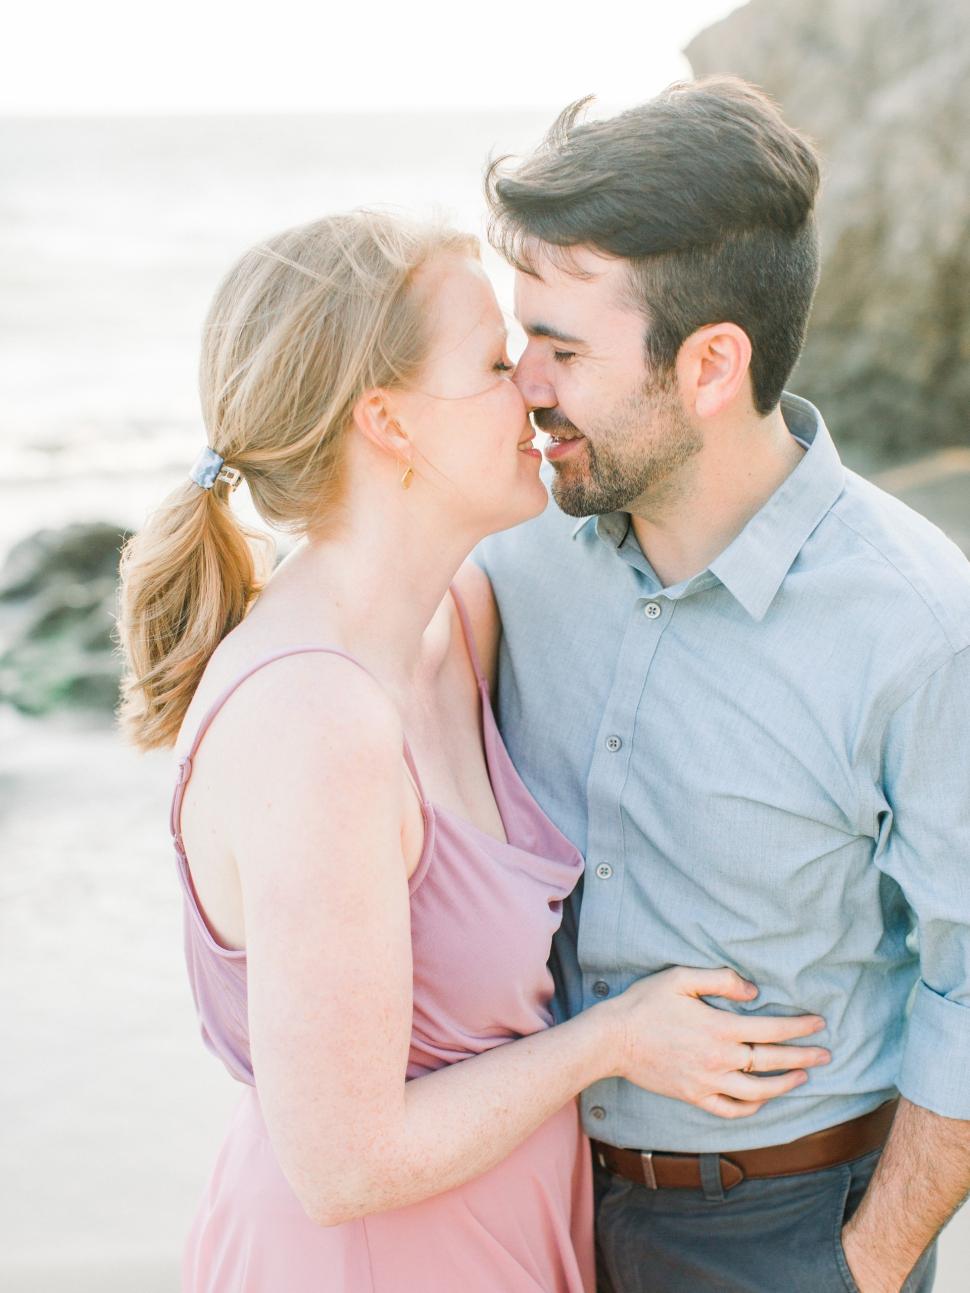 Malibu-Wedding-Photographer-Cassi-Claire-El-Matador-State-Beach-Engagement-Session_13.jpg